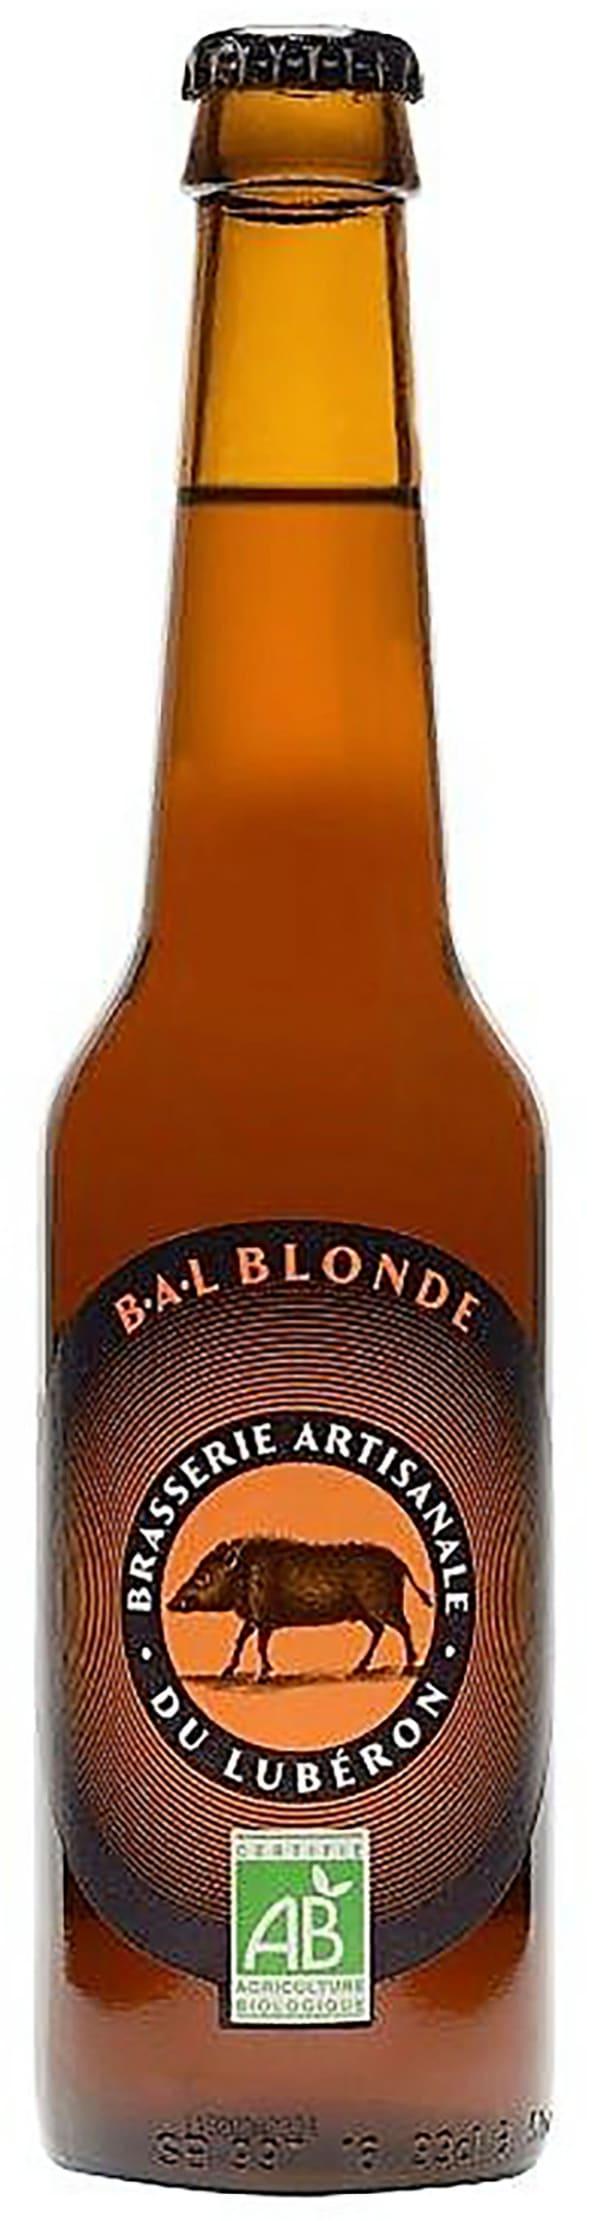 Bal Blonde